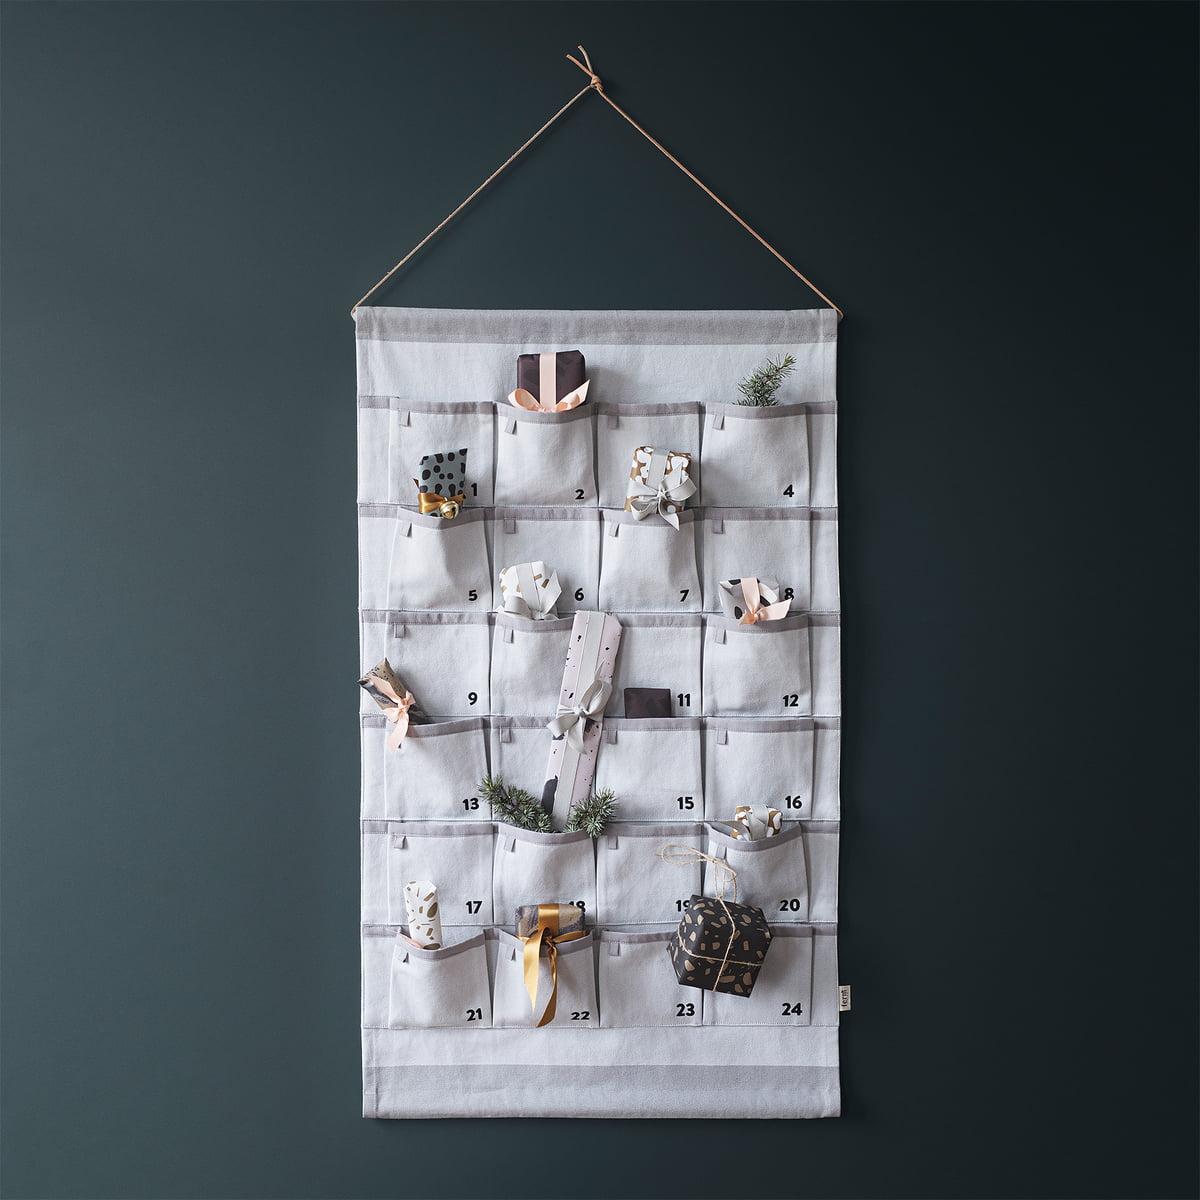 adventskalender von ferm living online kaufen. Black Bedroom Furniture Sets. Home Design Ideas